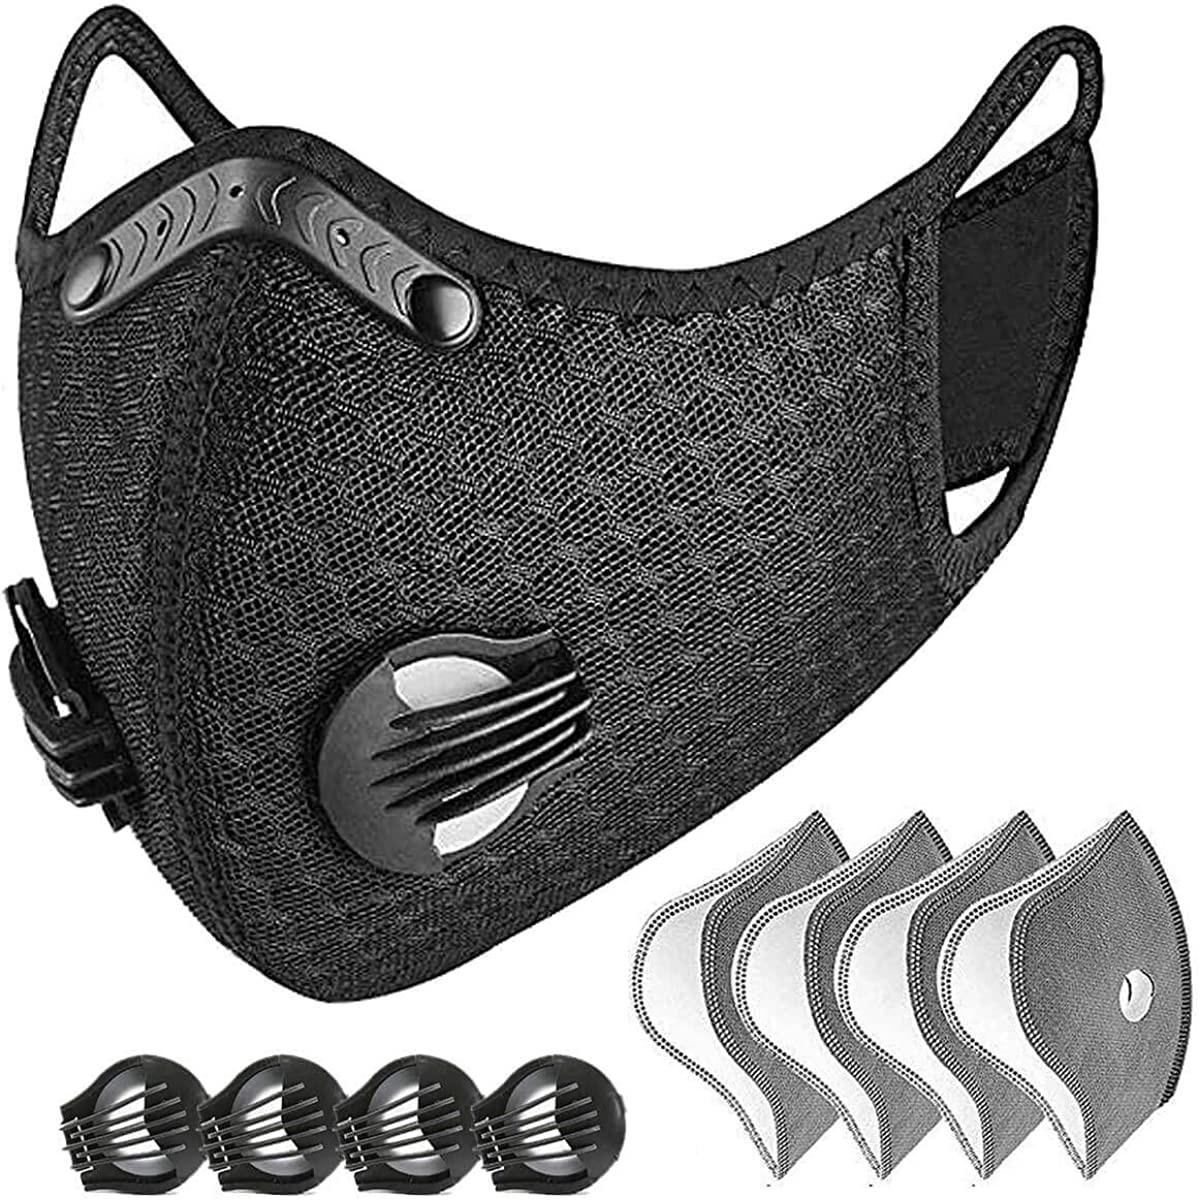 # H30 4でほこりフィルター4排気バルブハーフフェイス再利用可能な防塵レスピレーター自転車マスクサイクリングフェイスマスクレスピレーター